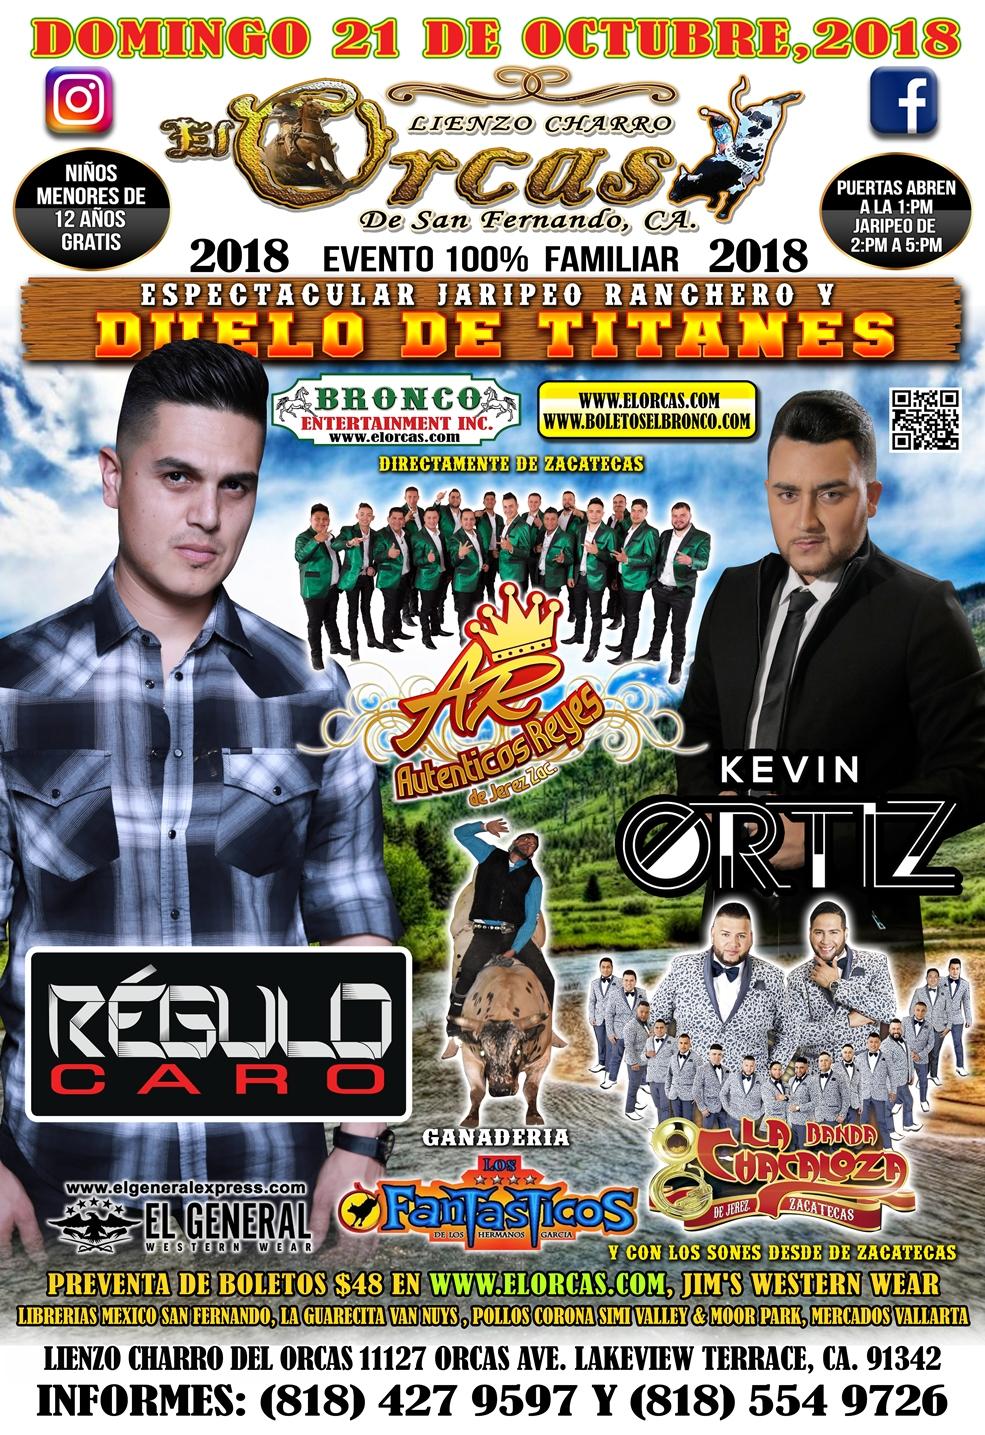 Gran Jaripeo - Kevin Ortiz & Regulo Caro! - Events - Universe